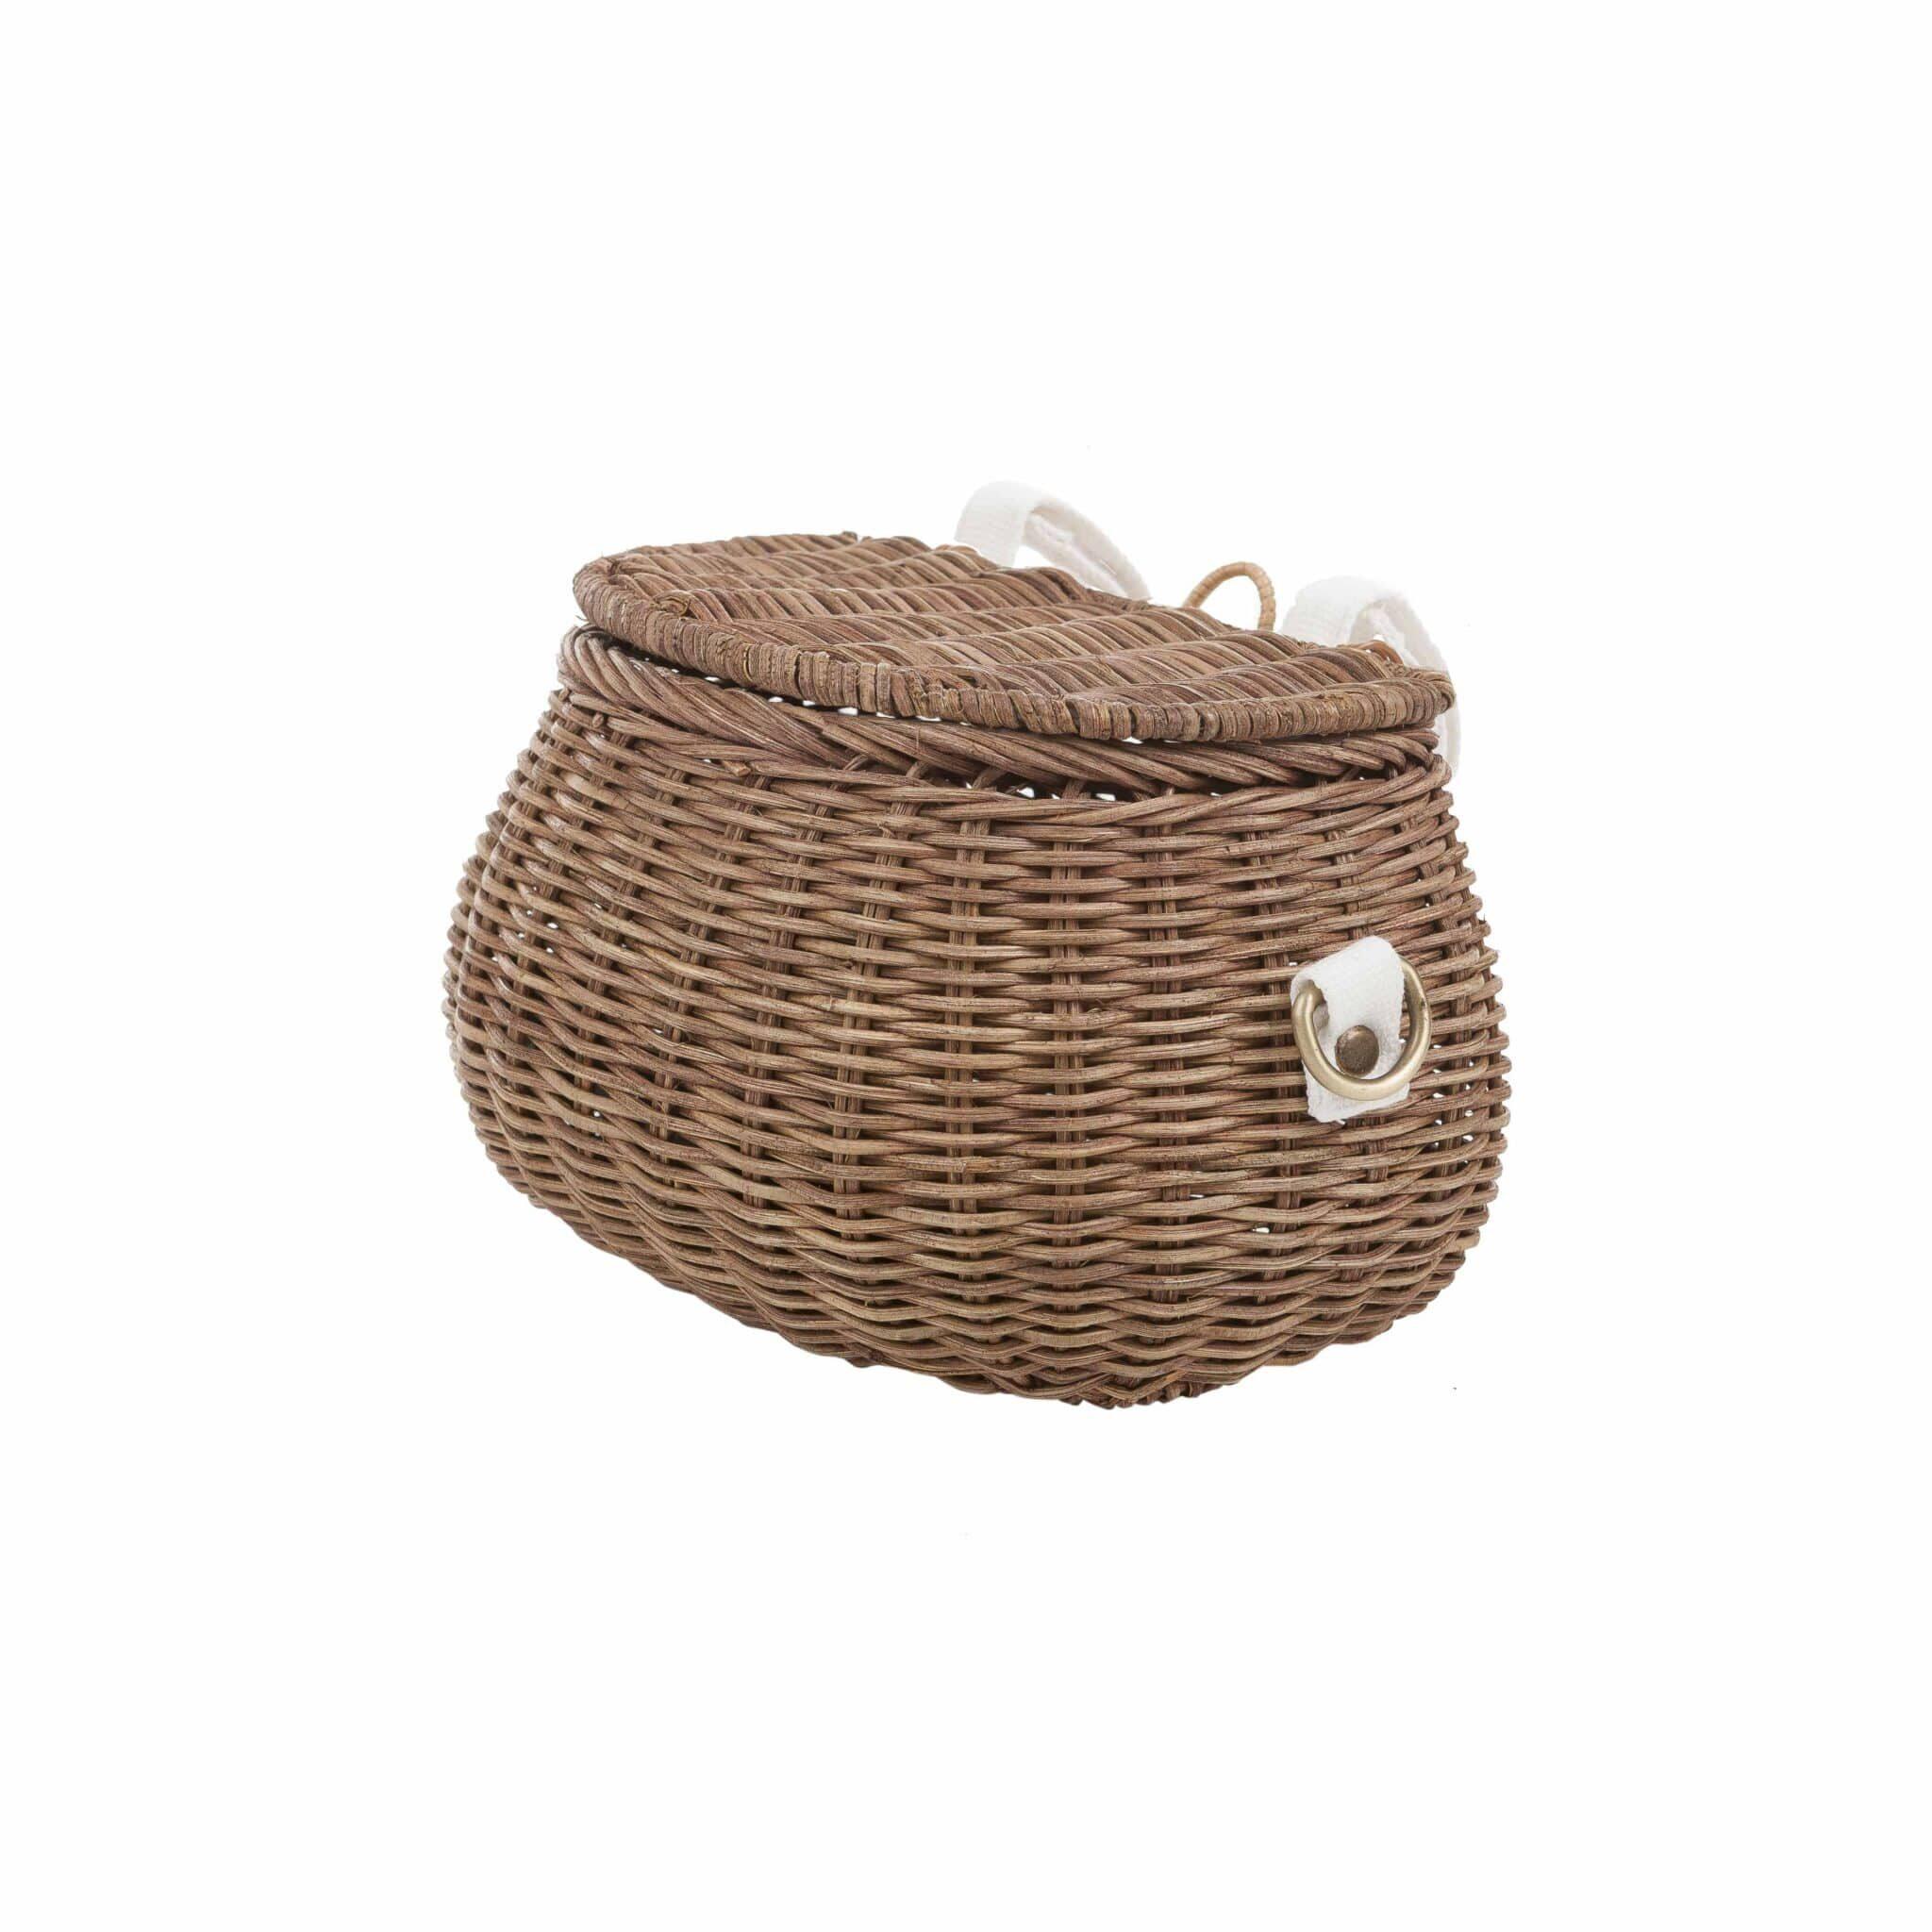 Olli Ella Mini Chari Natural Basket For Kids ⋆ Krokokinder